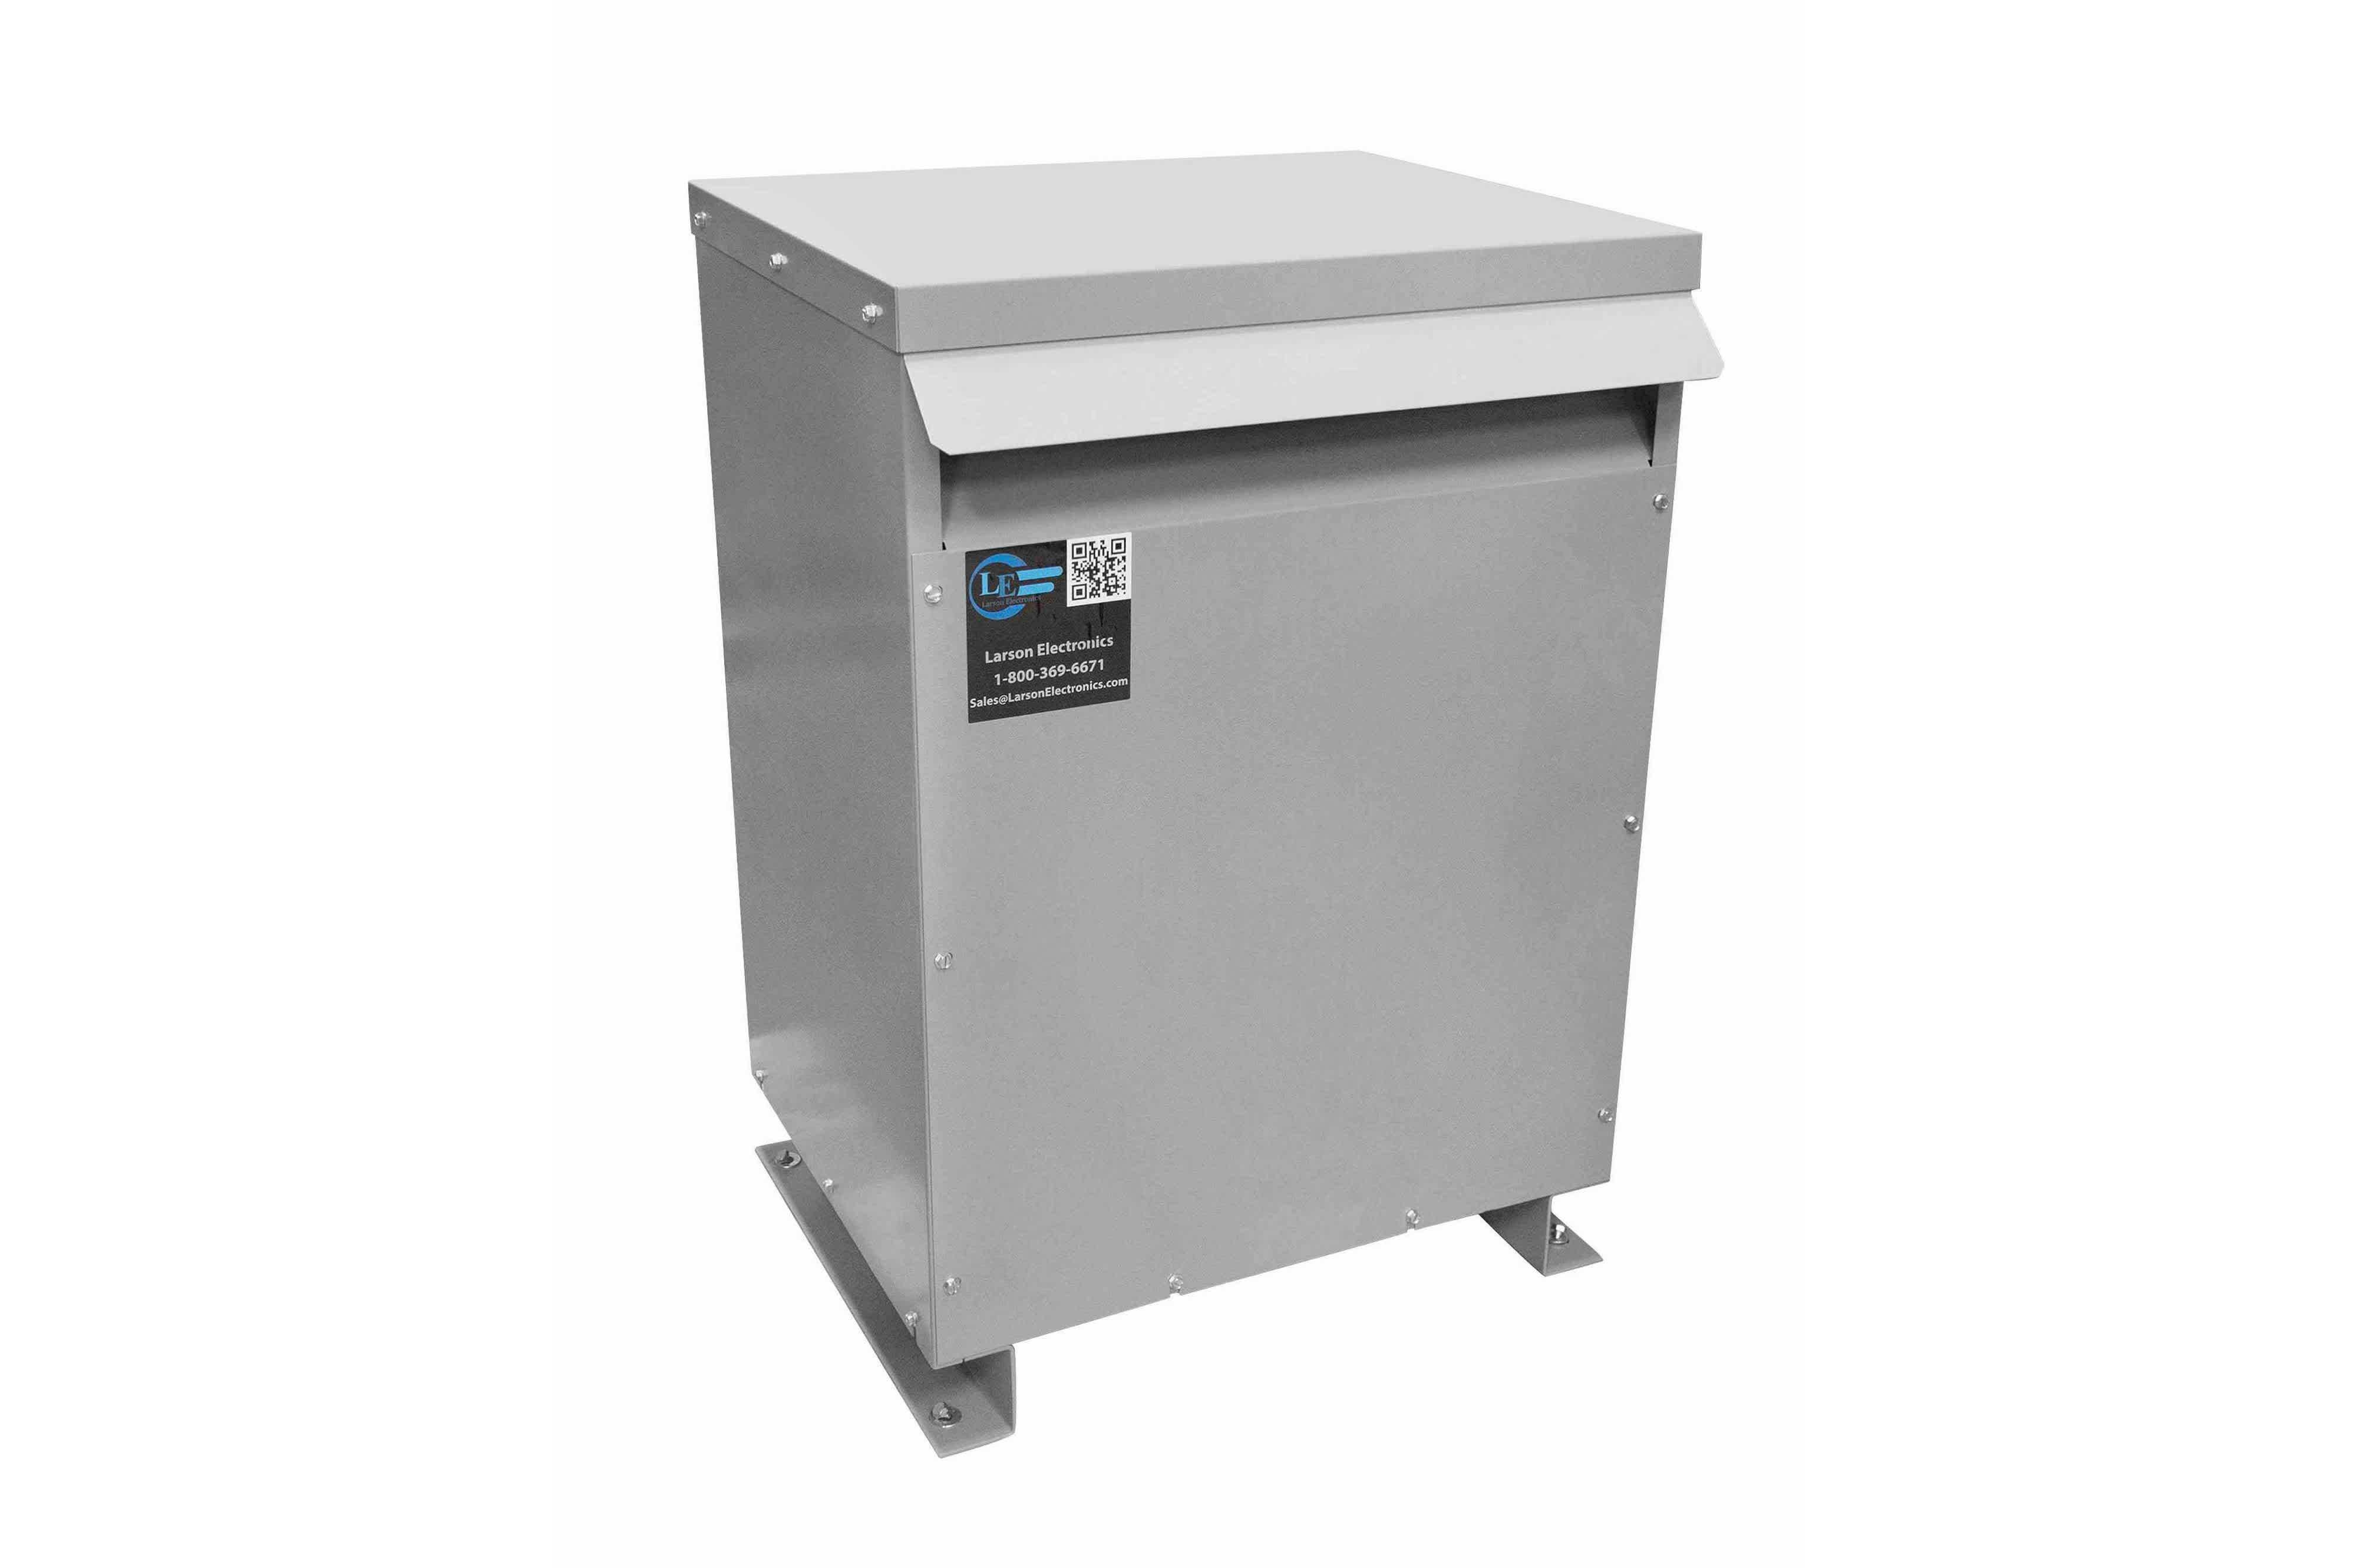 55 kVA 3PH Isolation Transformer, 208V Wye Primary, 415Y/240 Wye-N Secondary, N3R, Ventilated, 60 Hz